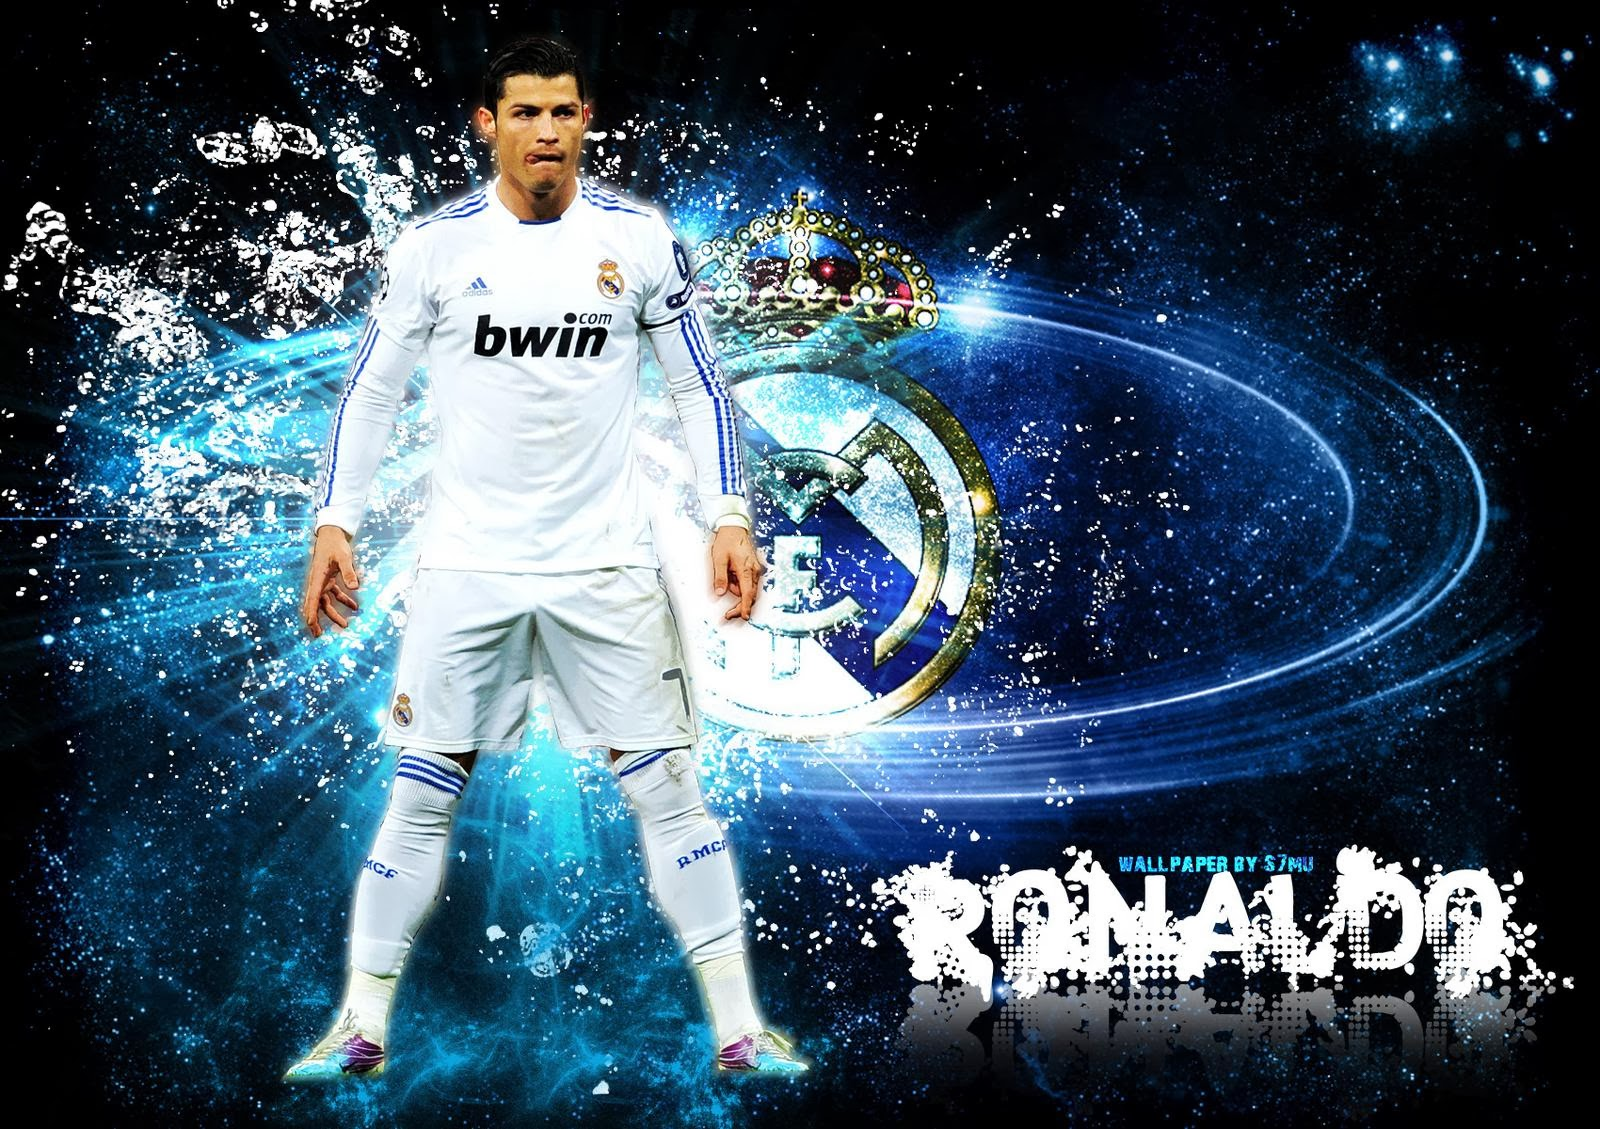 Ronaldo 2015 Wallpapers - Wallpaper Cave